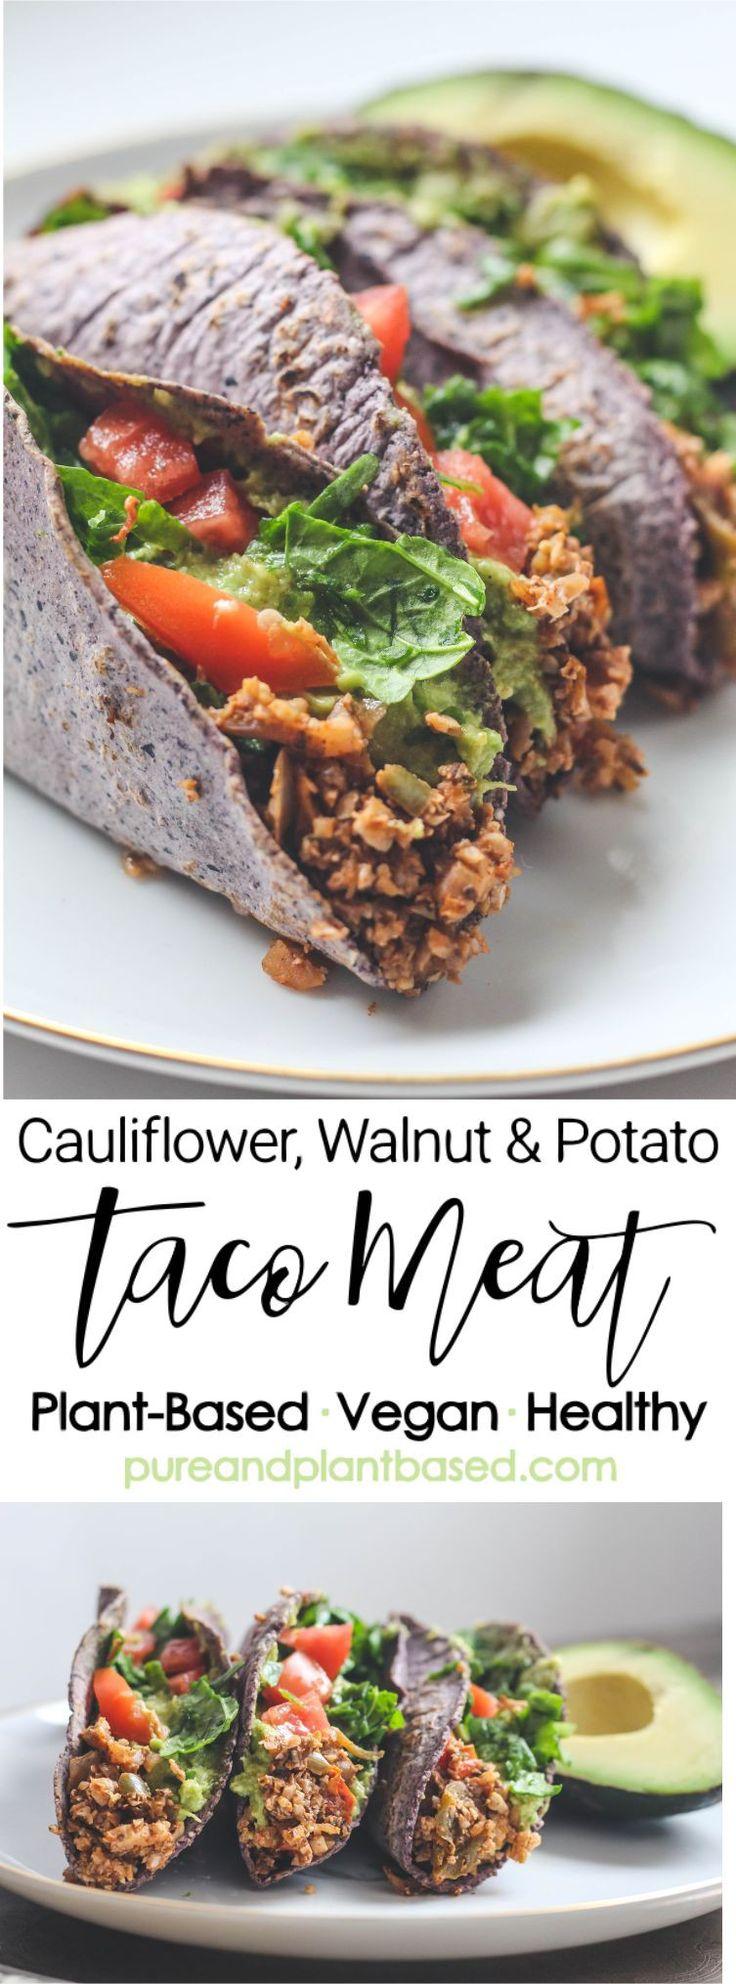 Plant-Based Taco Meat with Cauliflower, Walnuts, and Potato